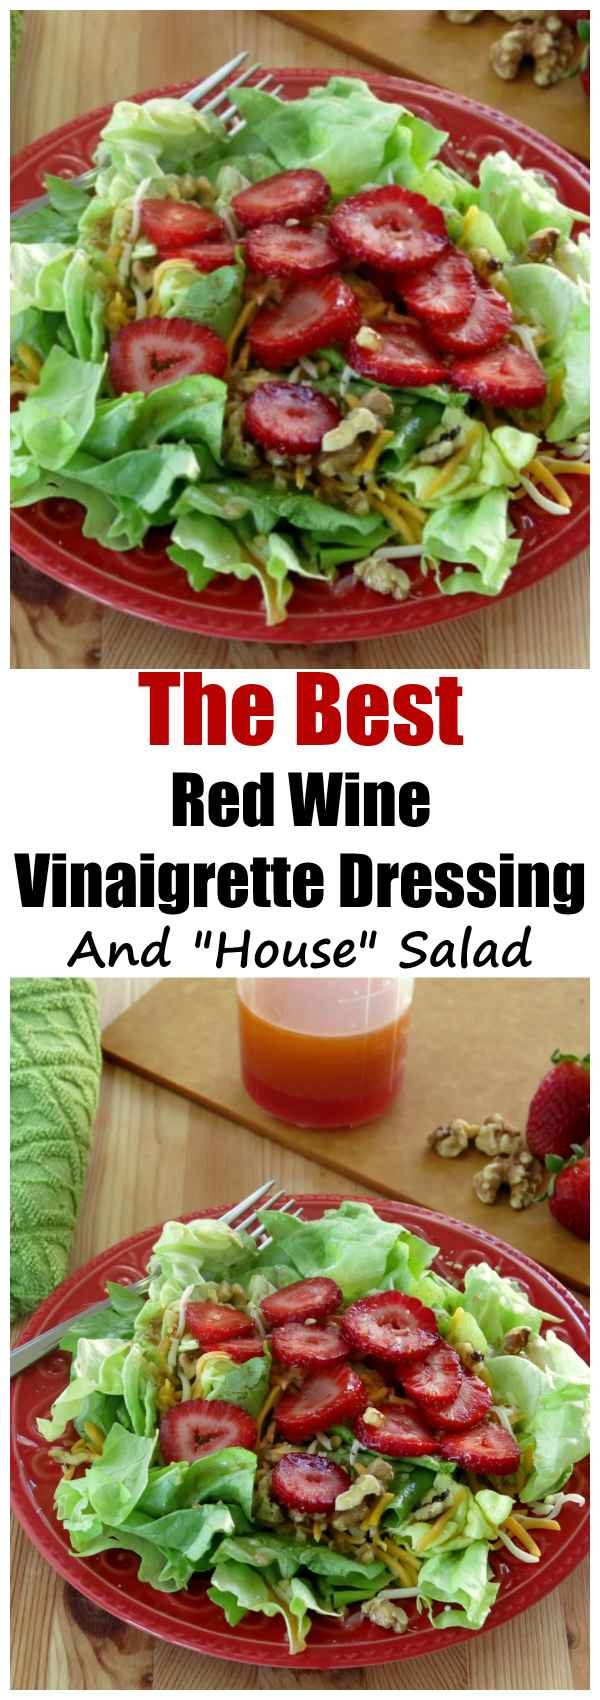 The Best Red Wine Vinaigrette Salad Dressing